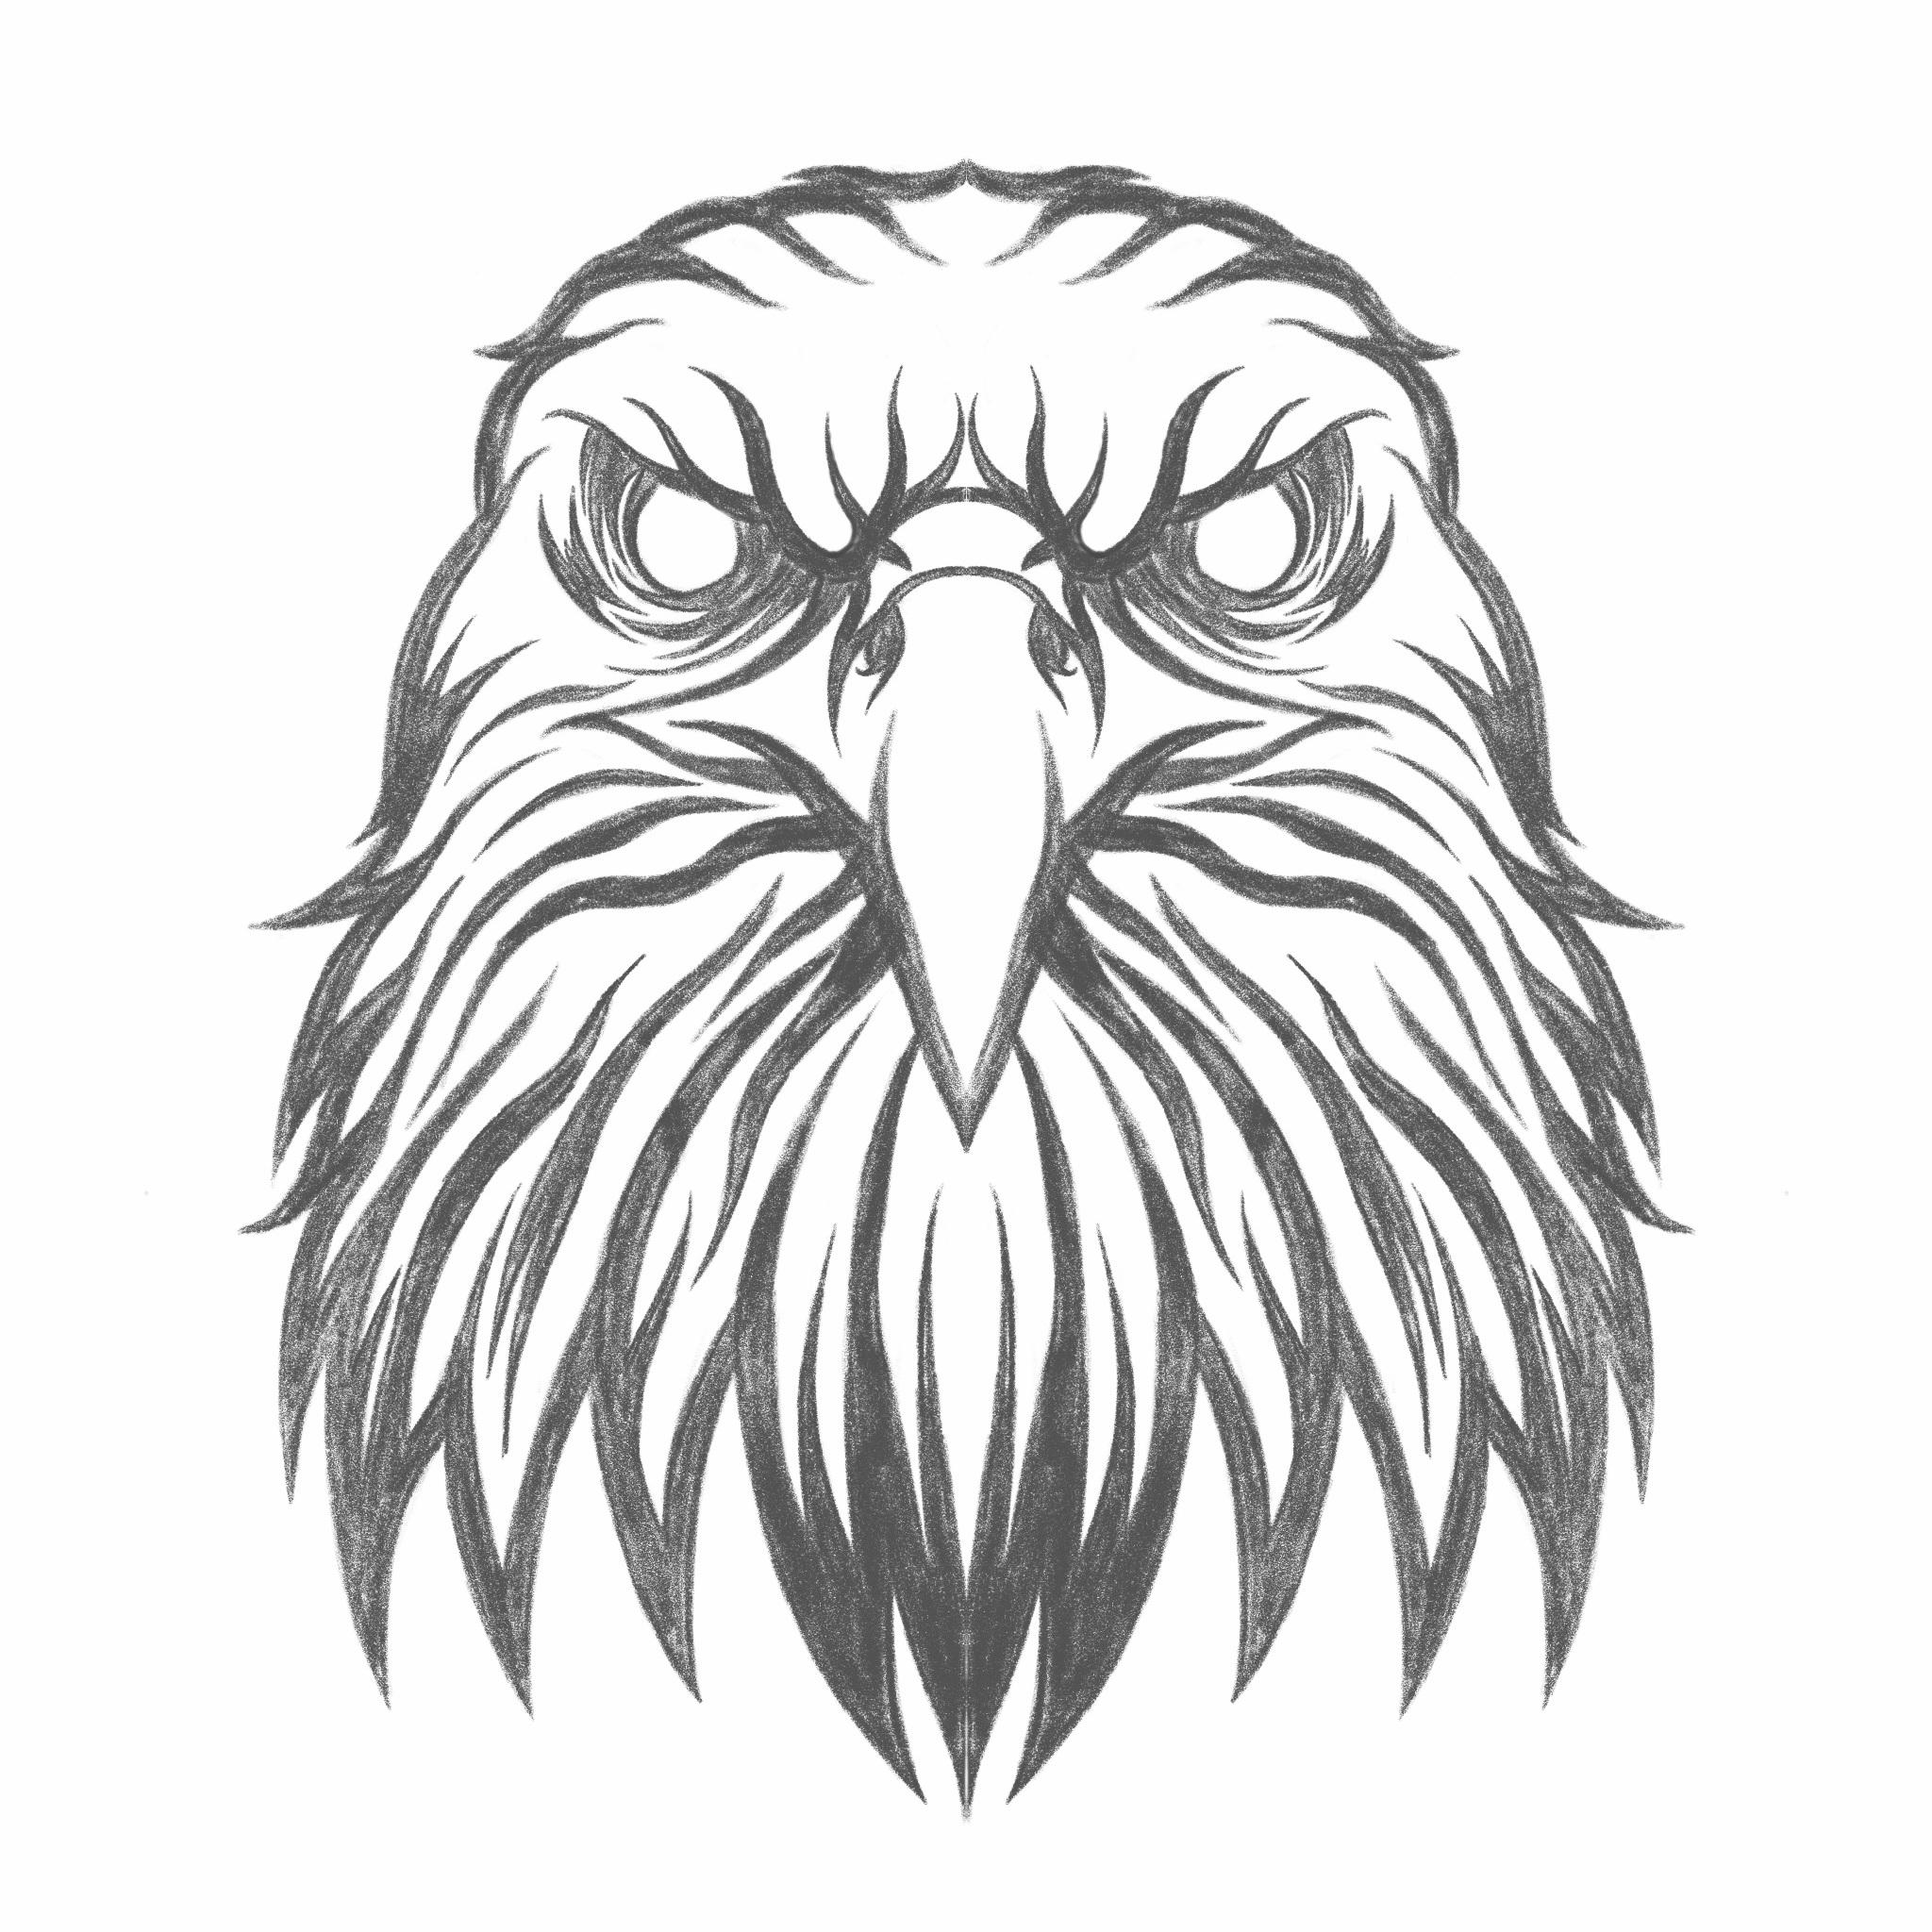 orozcodesign-keywaydesigns-eagle-illustration-sketch.jpg